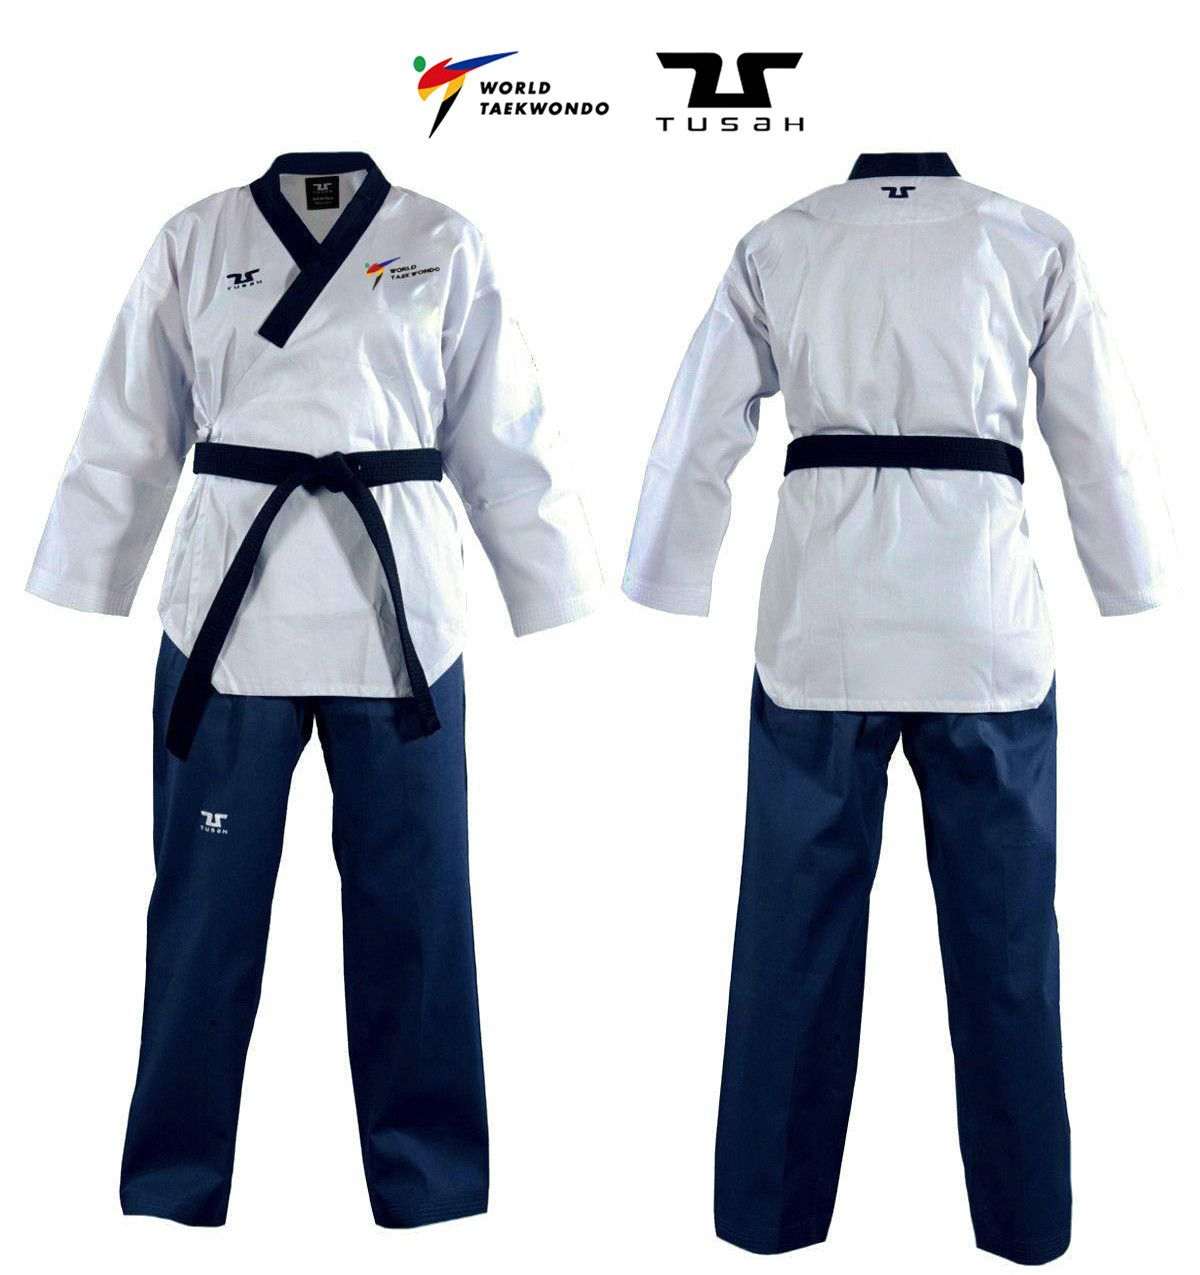 Tusah - Poomsae Easyfit Dan Femminile per Taekwondo Omologato WT per forme e competizioni